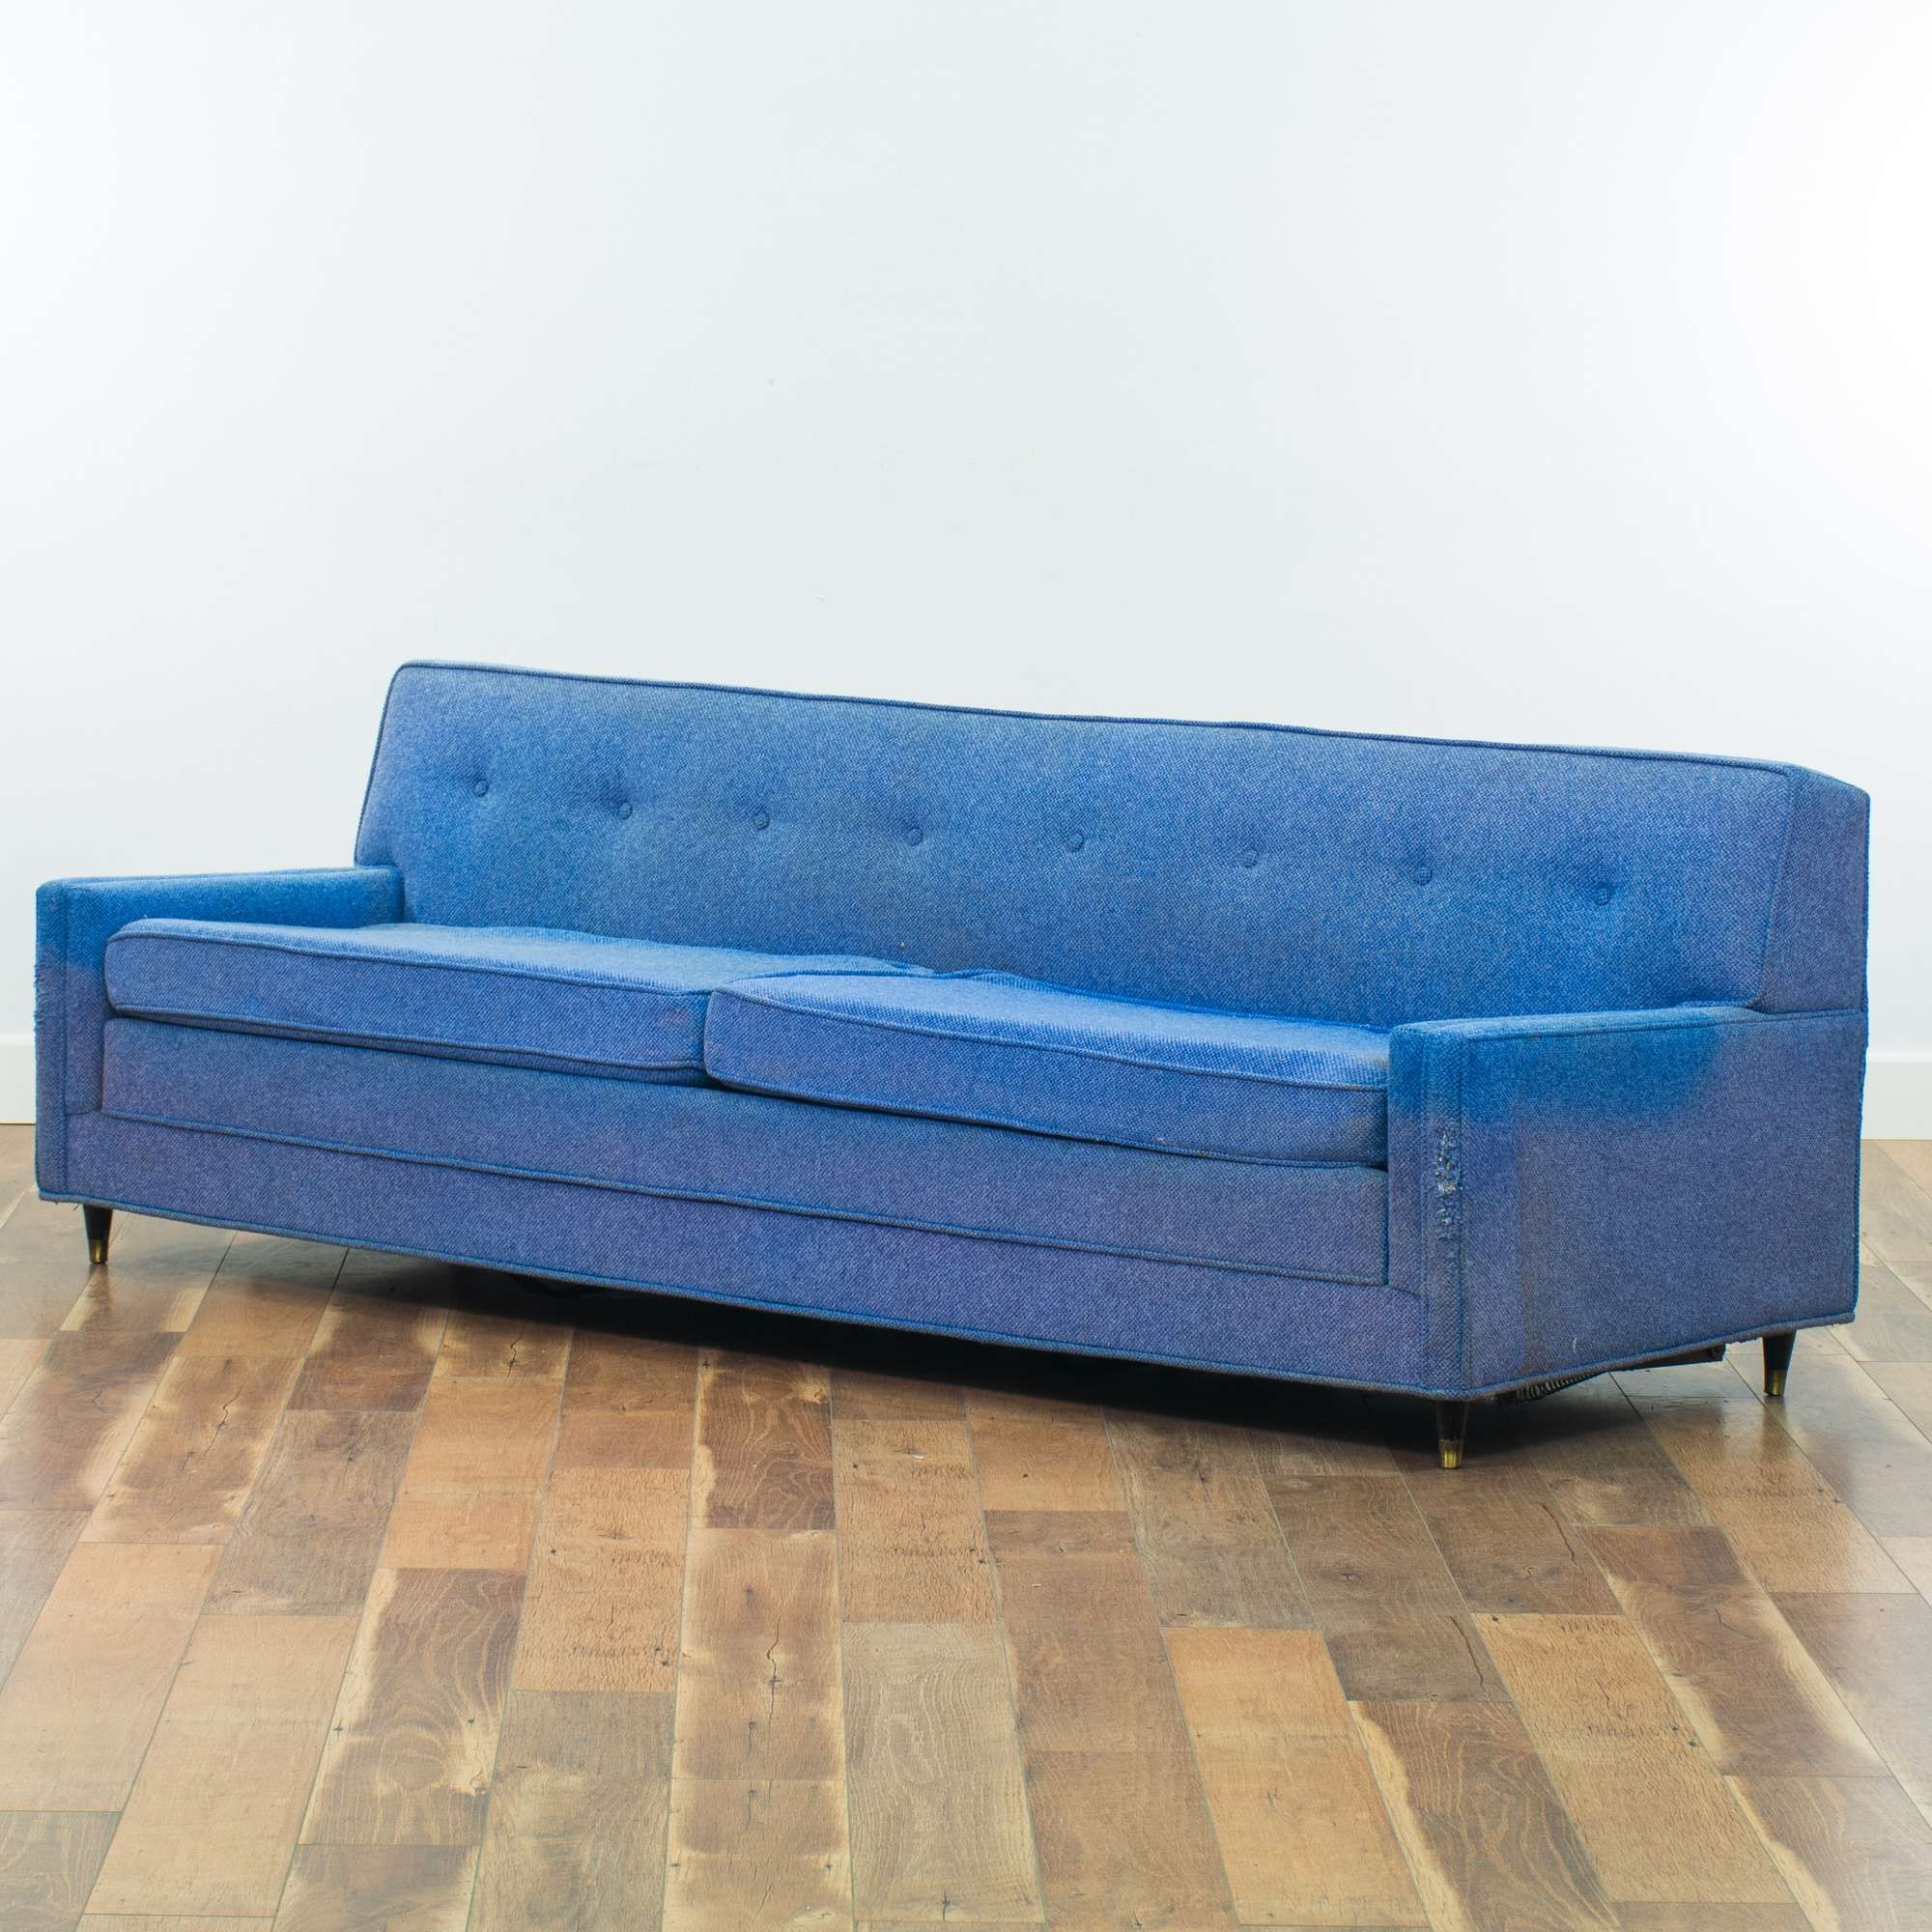 Seng Blue Mid Century Modern Sleeper Sofa Loveseat Vintage